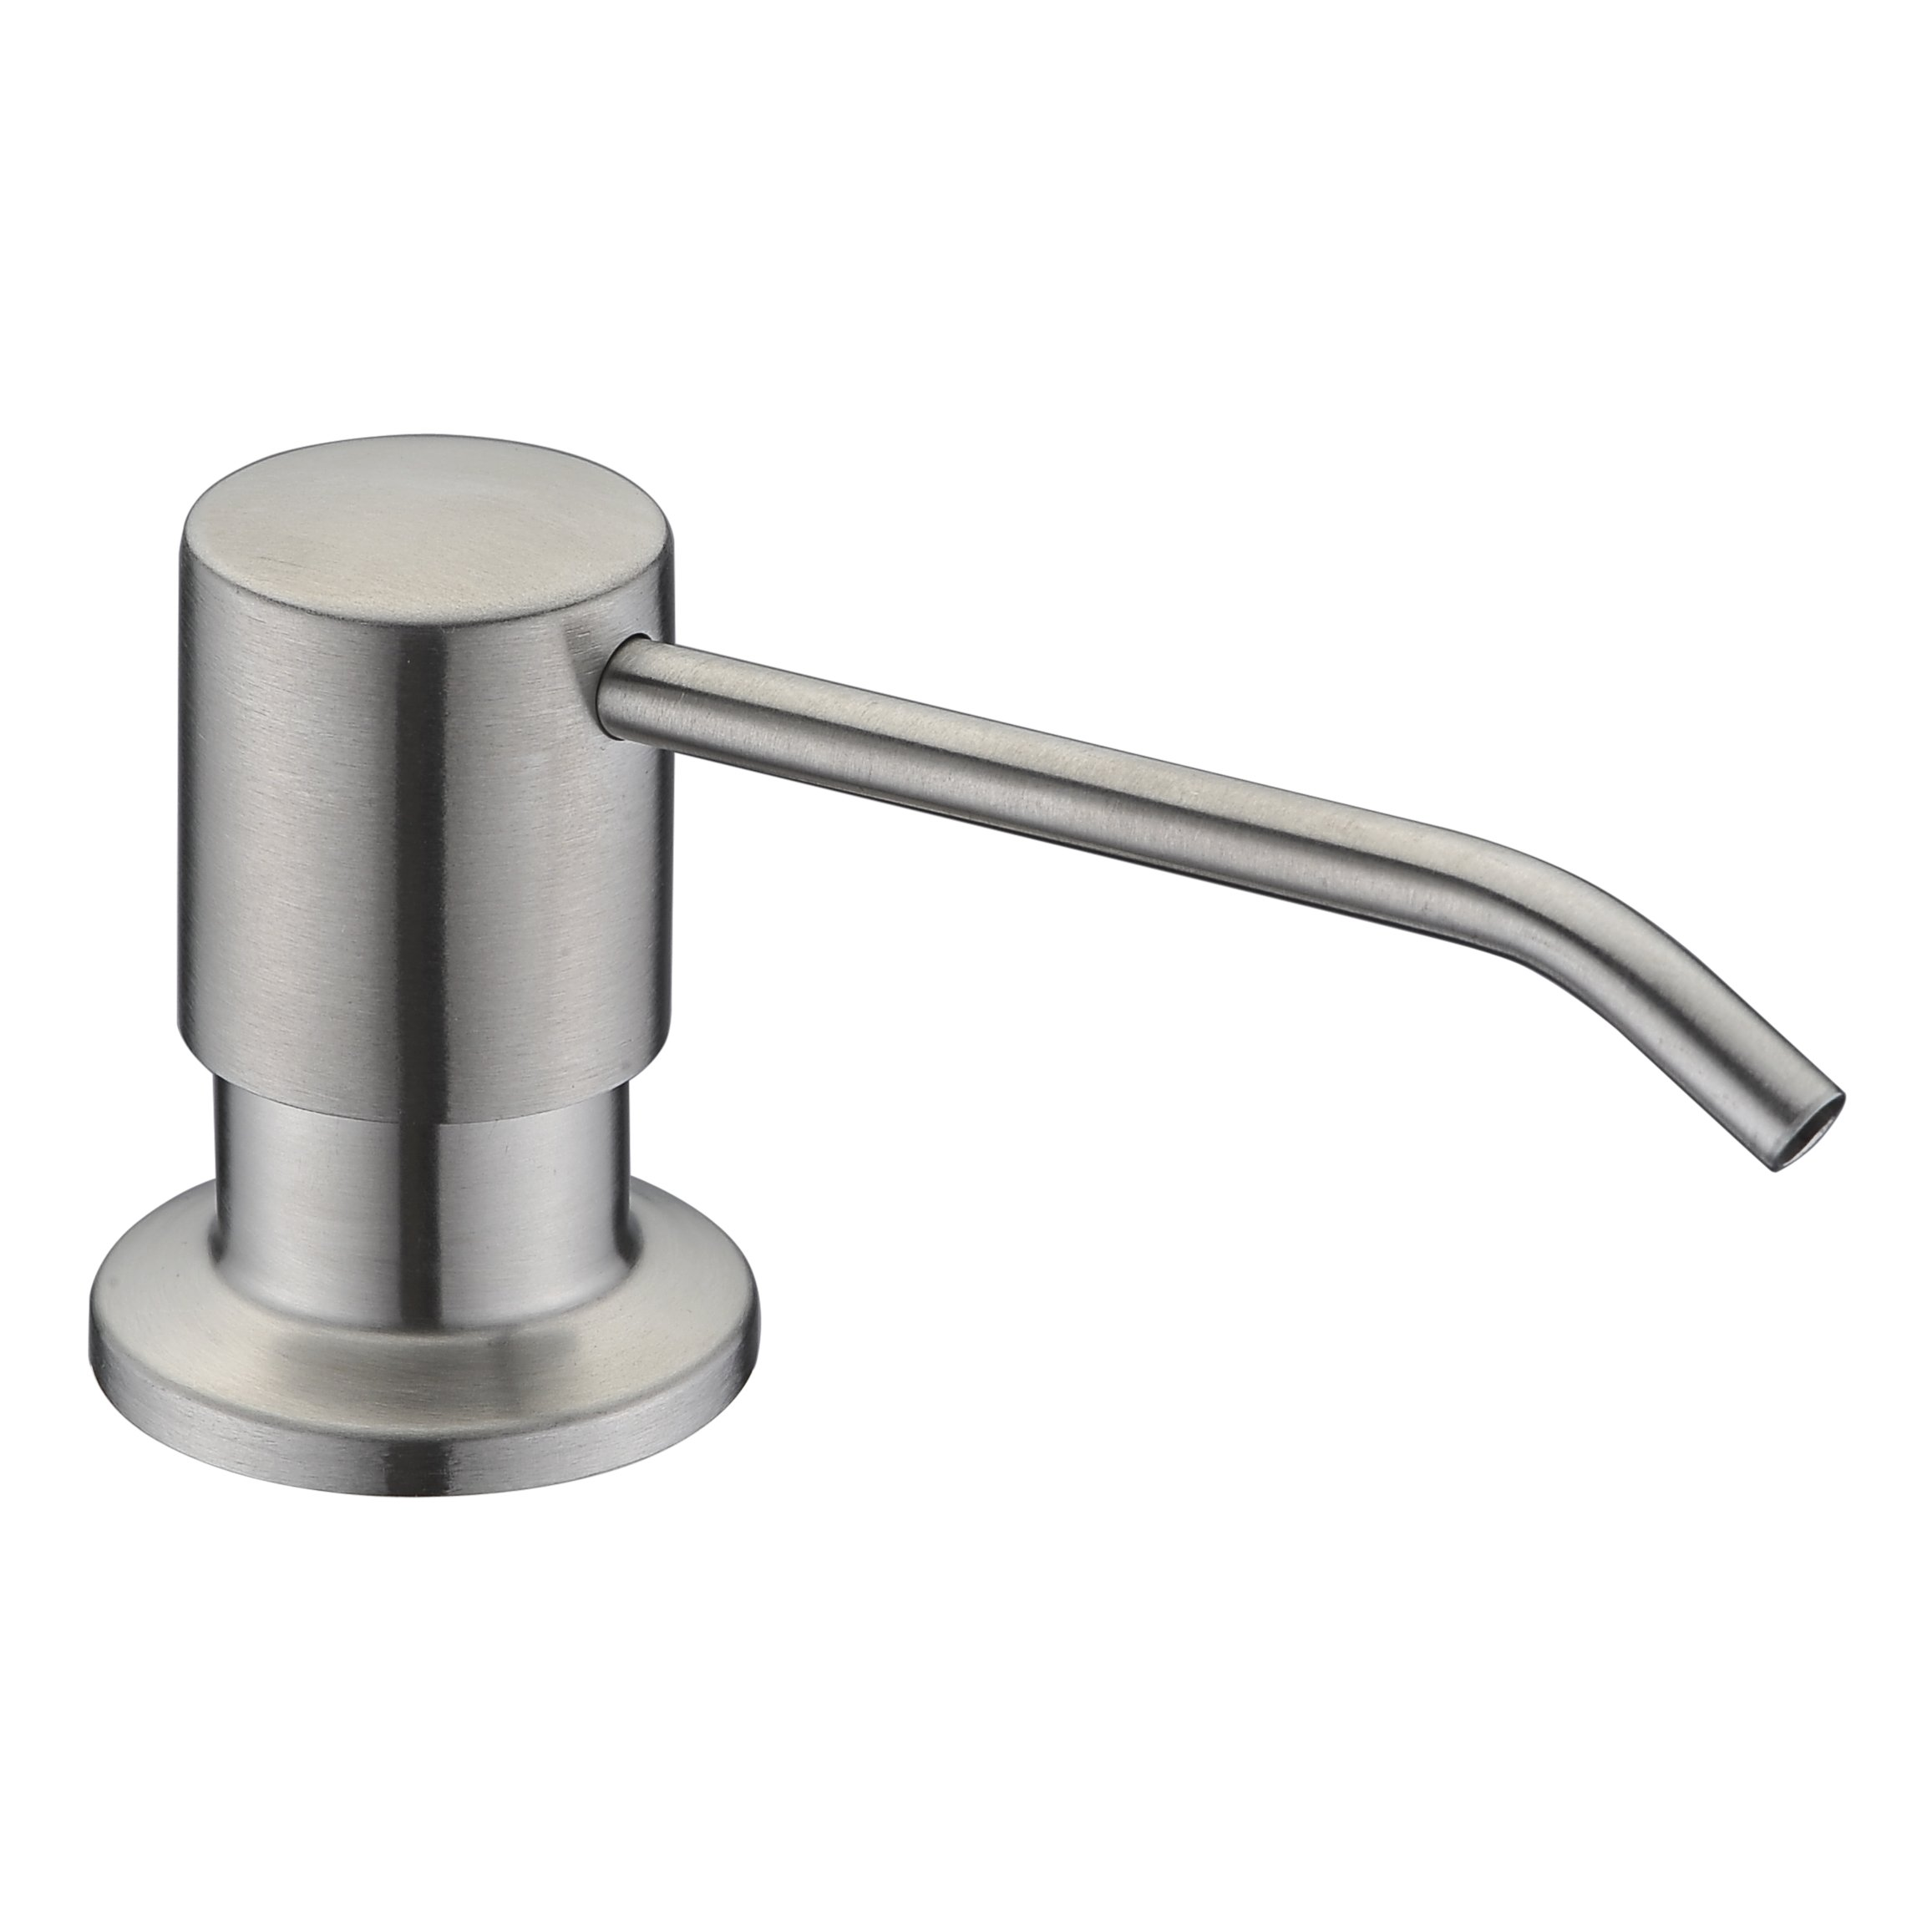 WENKEN Sink Soap Dispenser Best Stainless Steel Built in Pump Kitchen Soap Dispenser Large Capacity 17 OZ Bottle Brushed Nickel by WENKEN